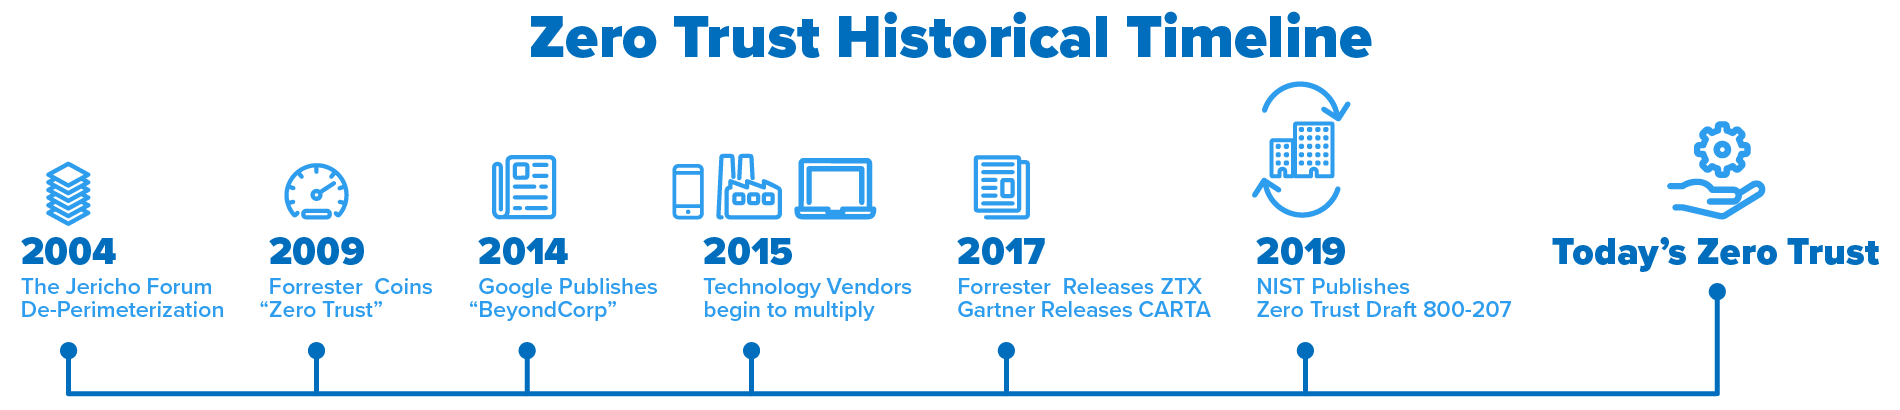 zero trust historical timeline